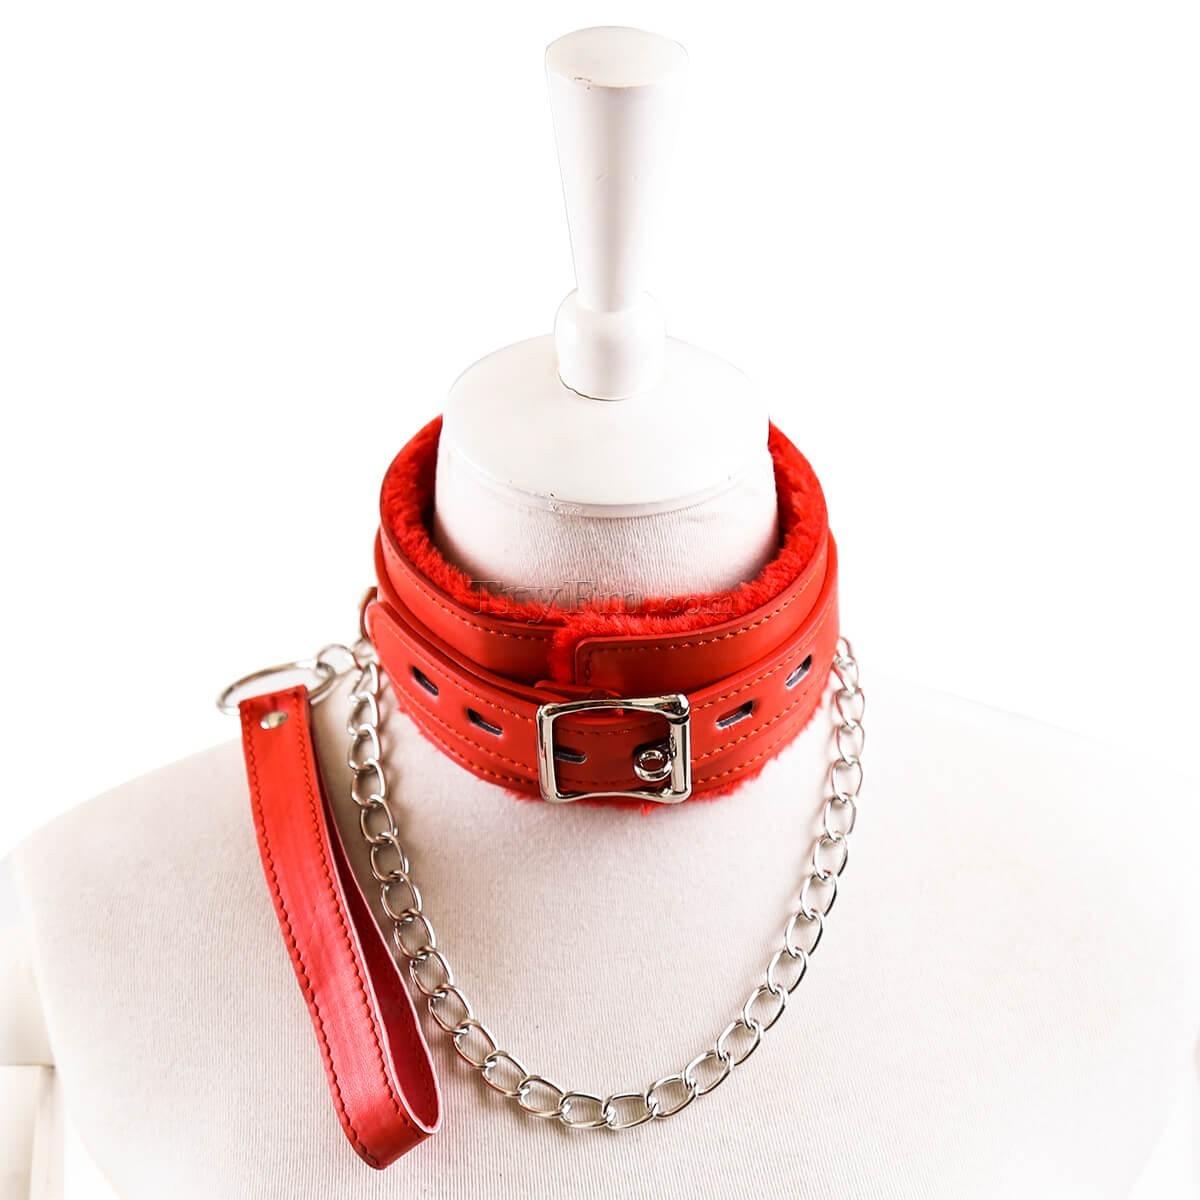 4-sex-slave-collar12.jpg